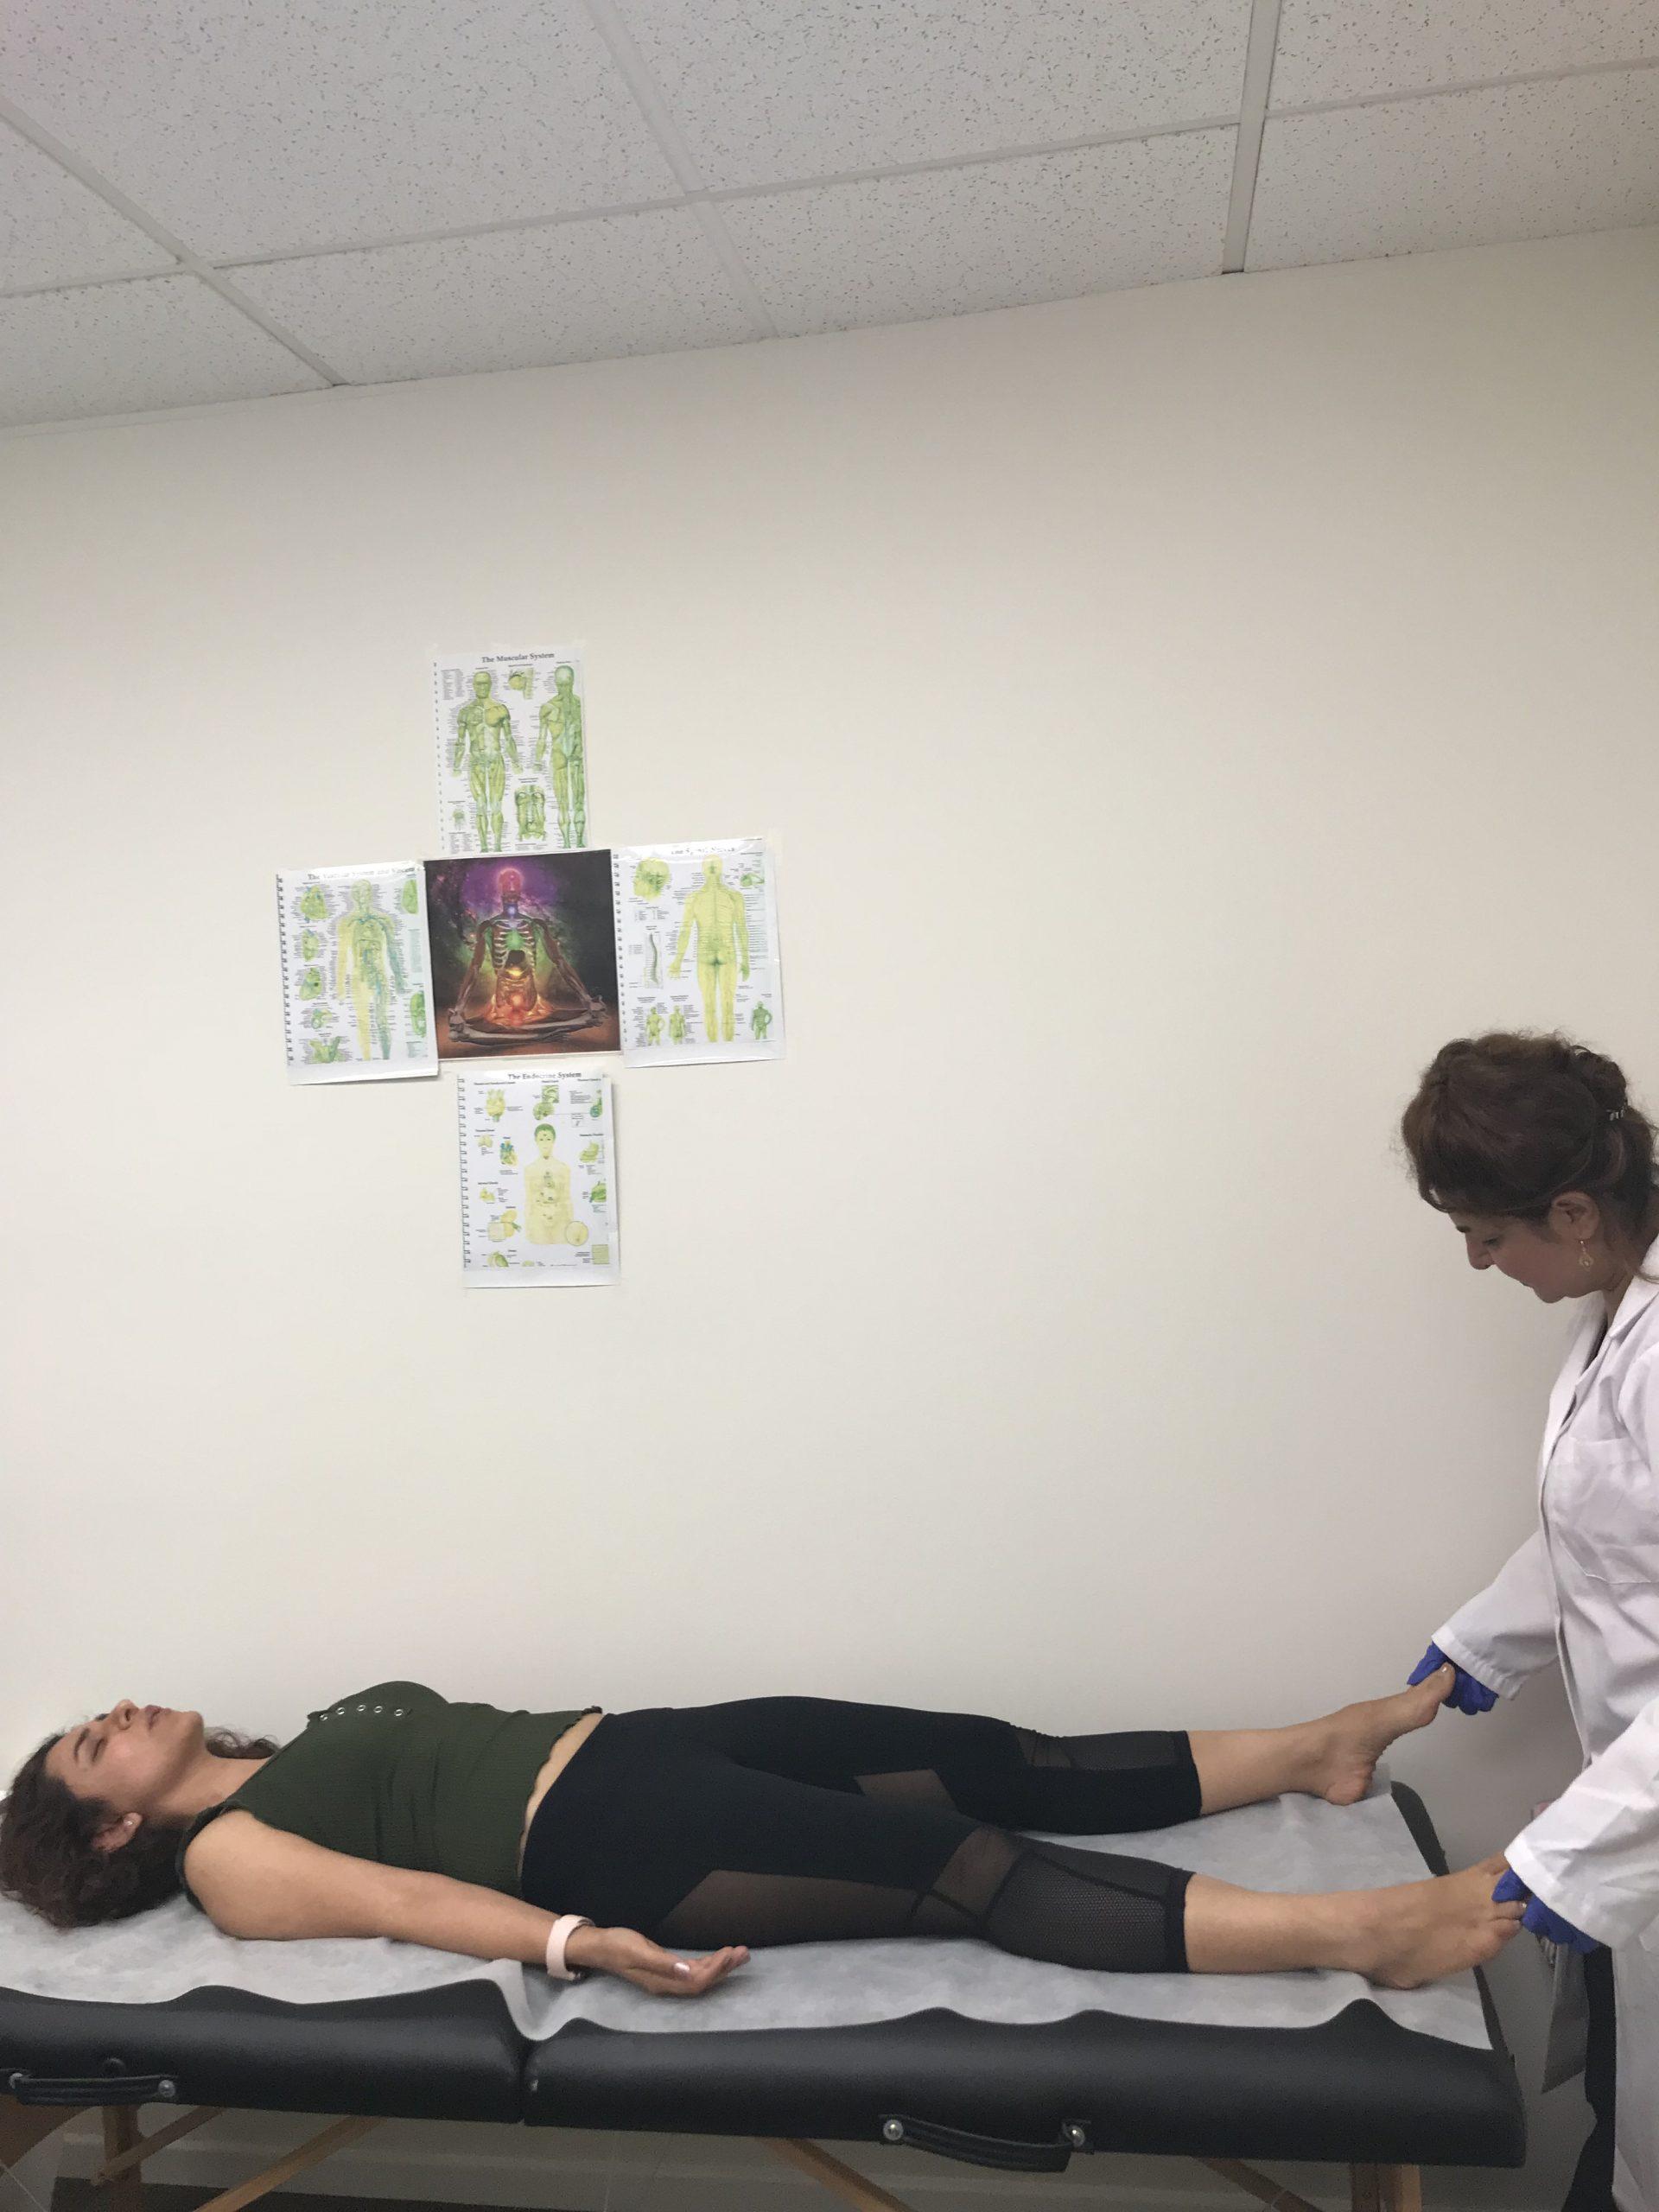 Holistic Health Service – my traditional yoga